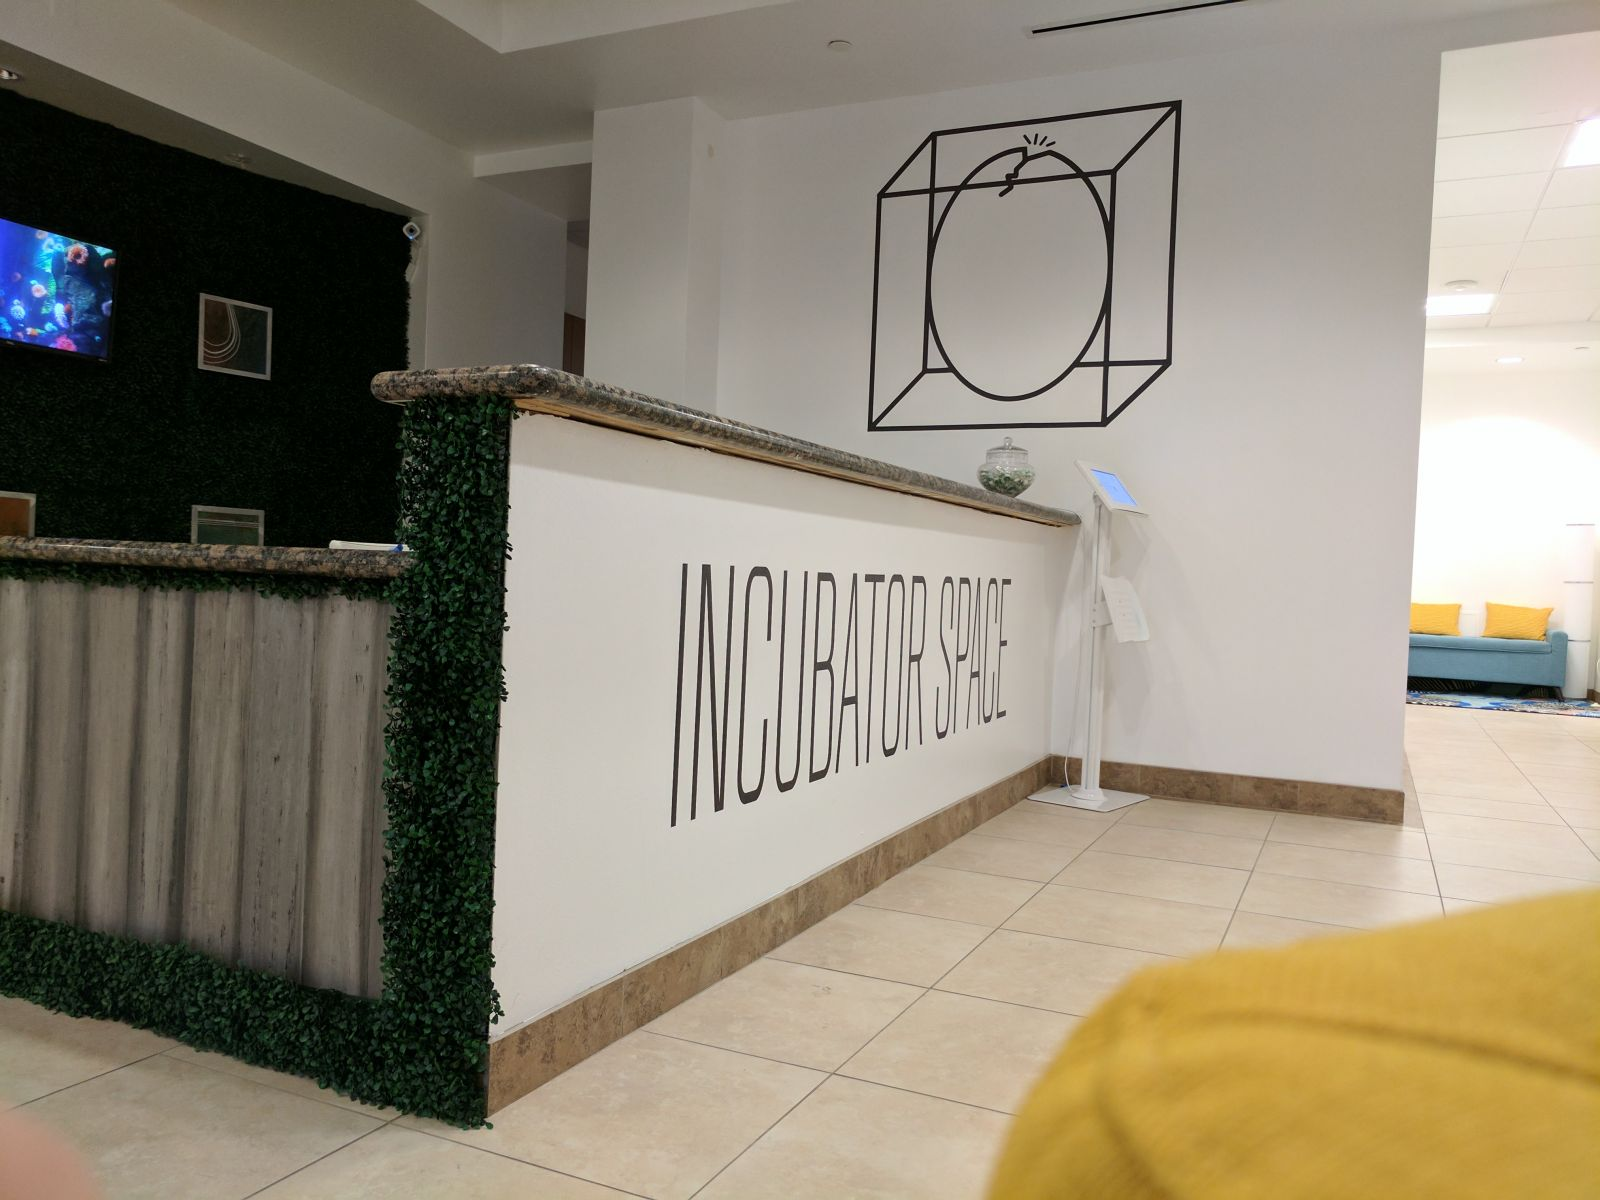 Incubator Space, Henderson